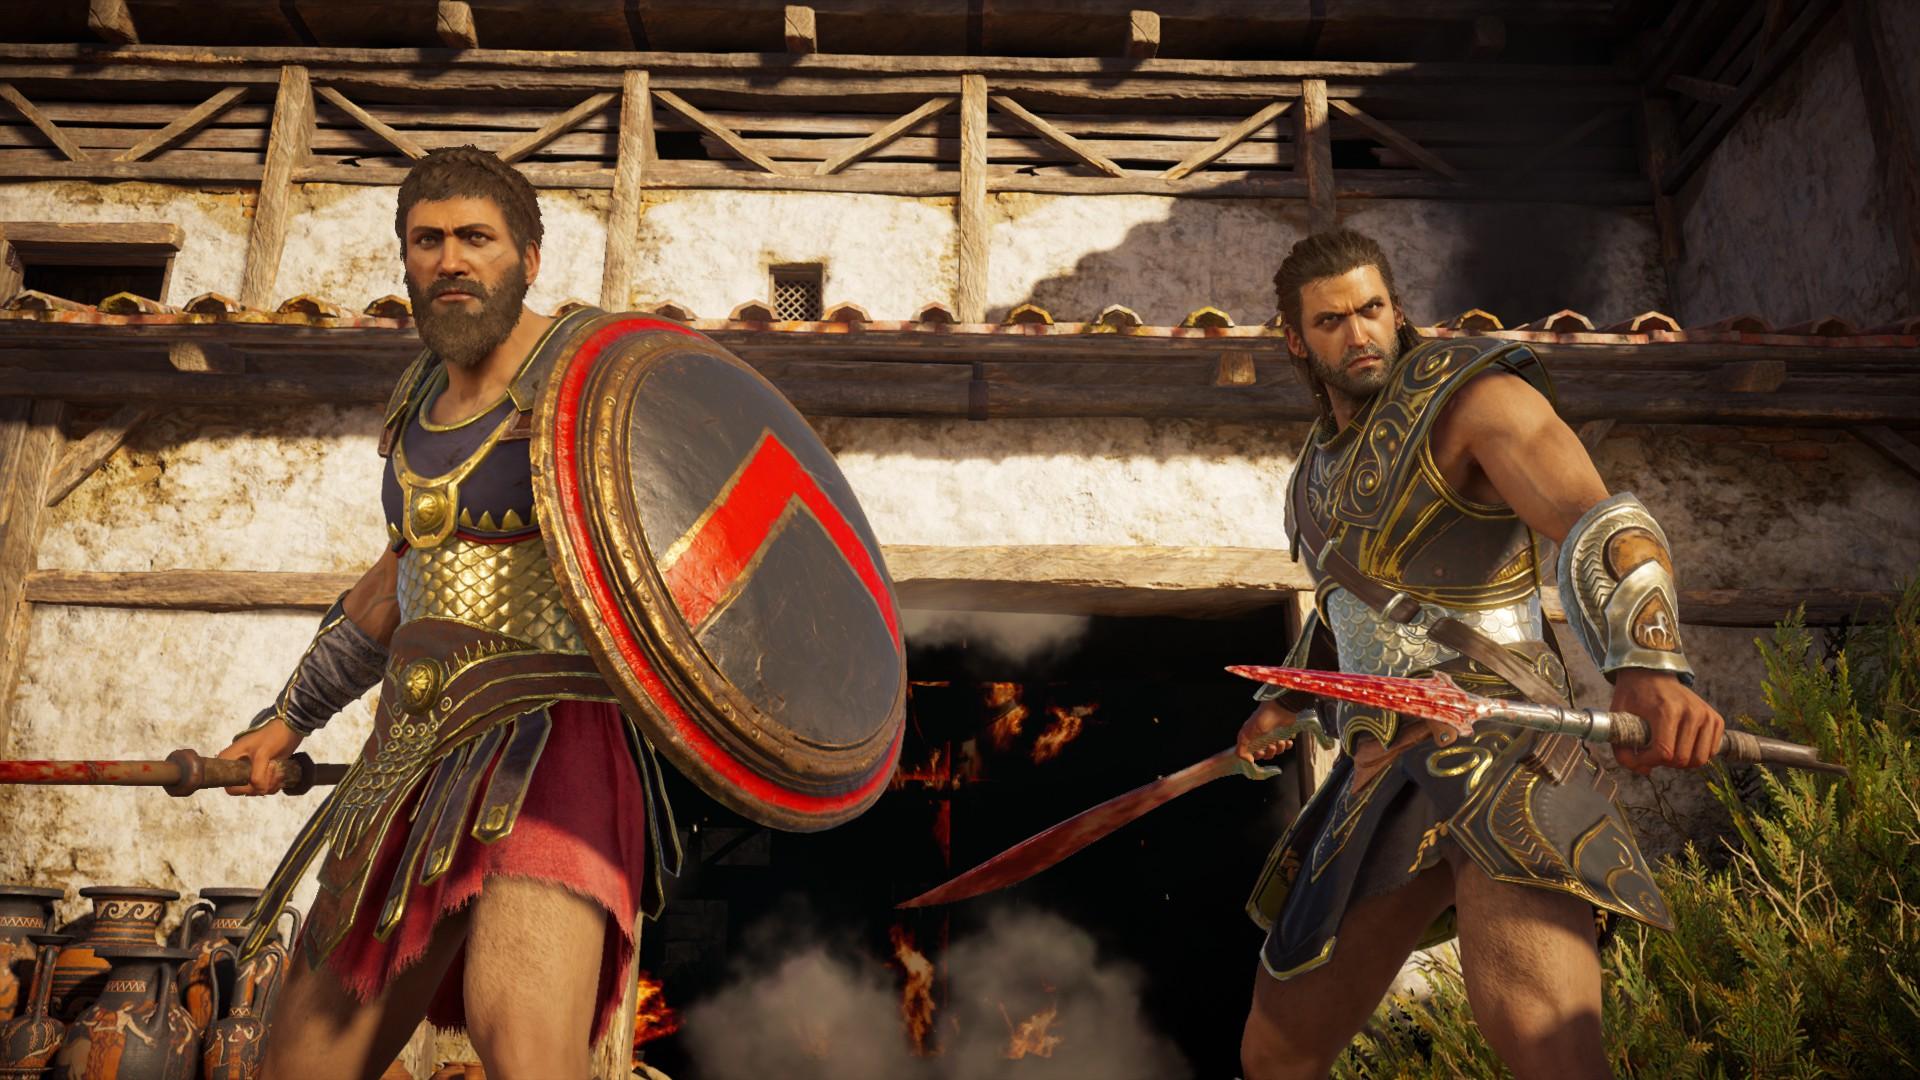 20181022214947_1.jpg - Assassin's Creed: Odyssey